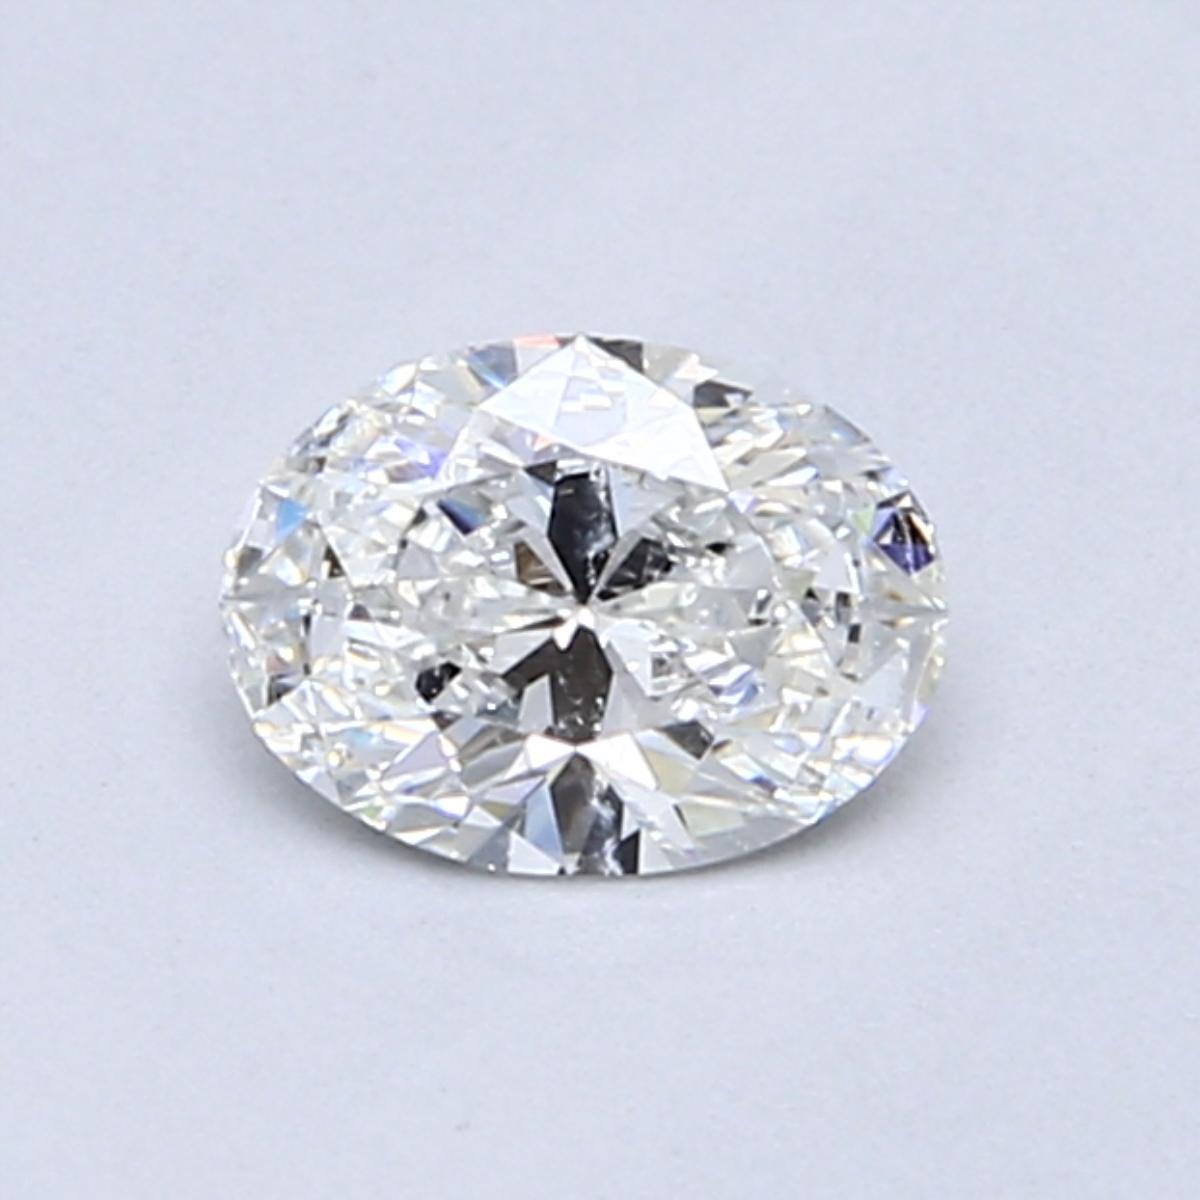 0.54 Carat F SI2 Oval Diamond